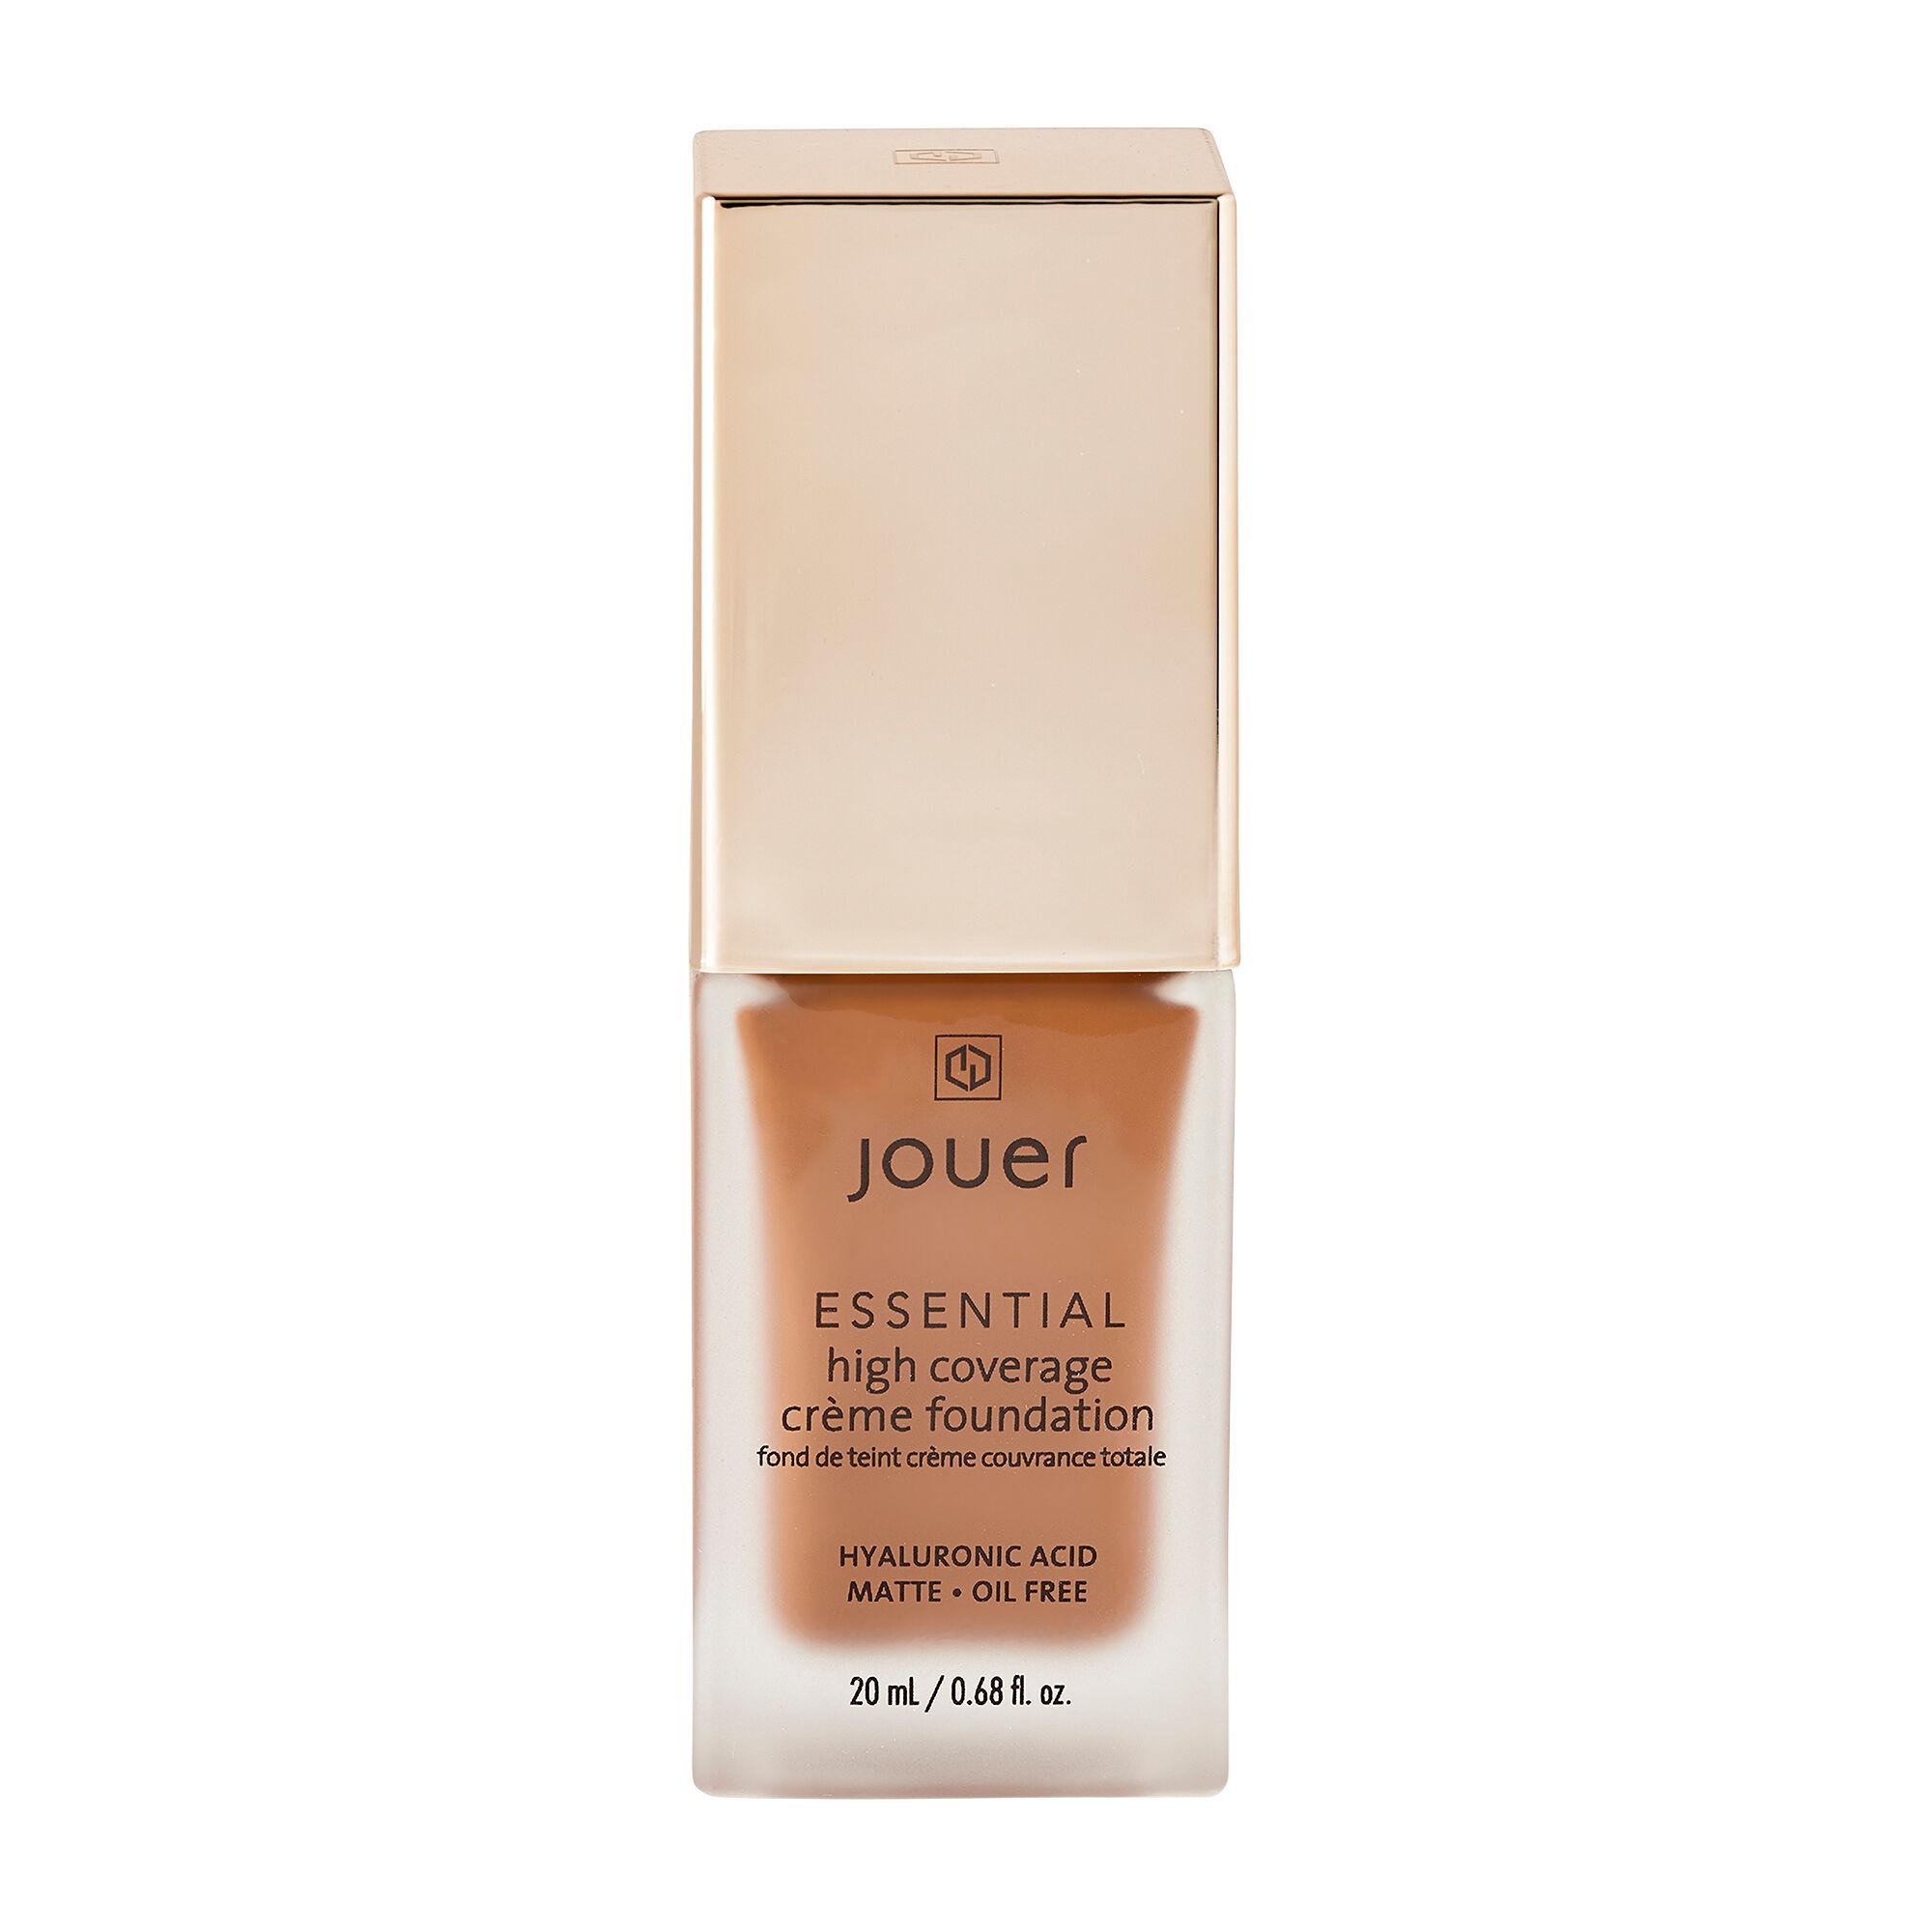 Jouer Cosmetics Essential High Coverage Creme Foundation Carob 20ml